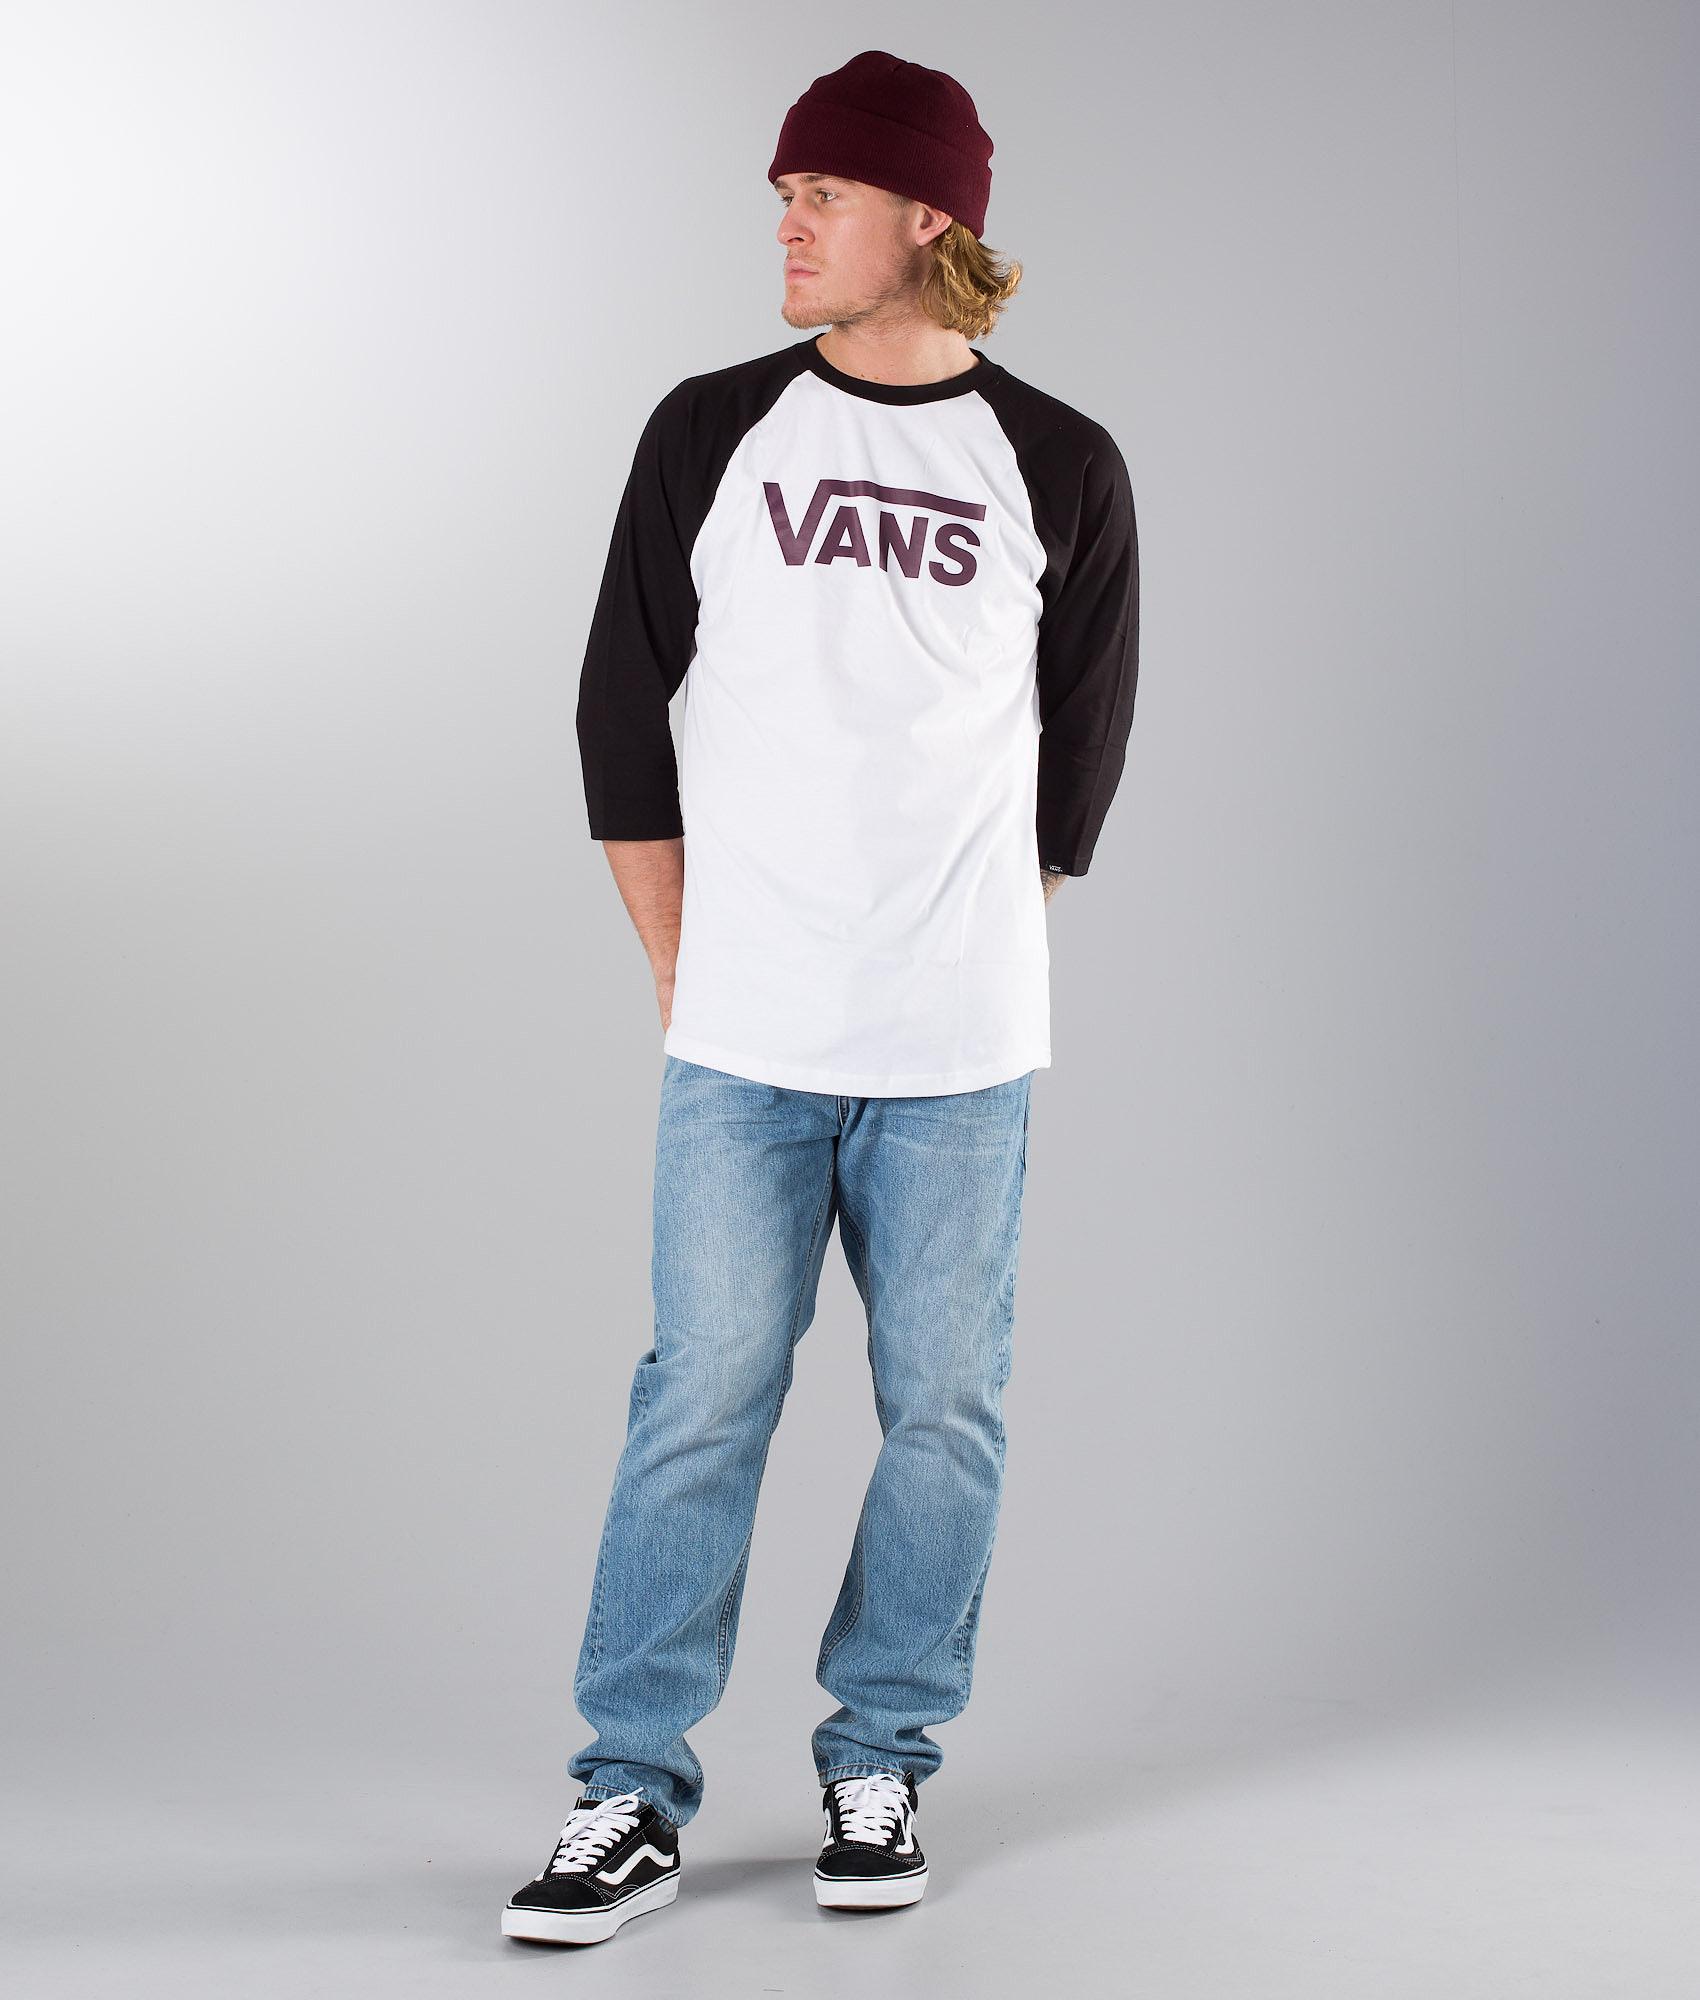 312cab9ba23250 Vans Classic Raglan T-shirt White-Black-Port Royale - Ridestore.com